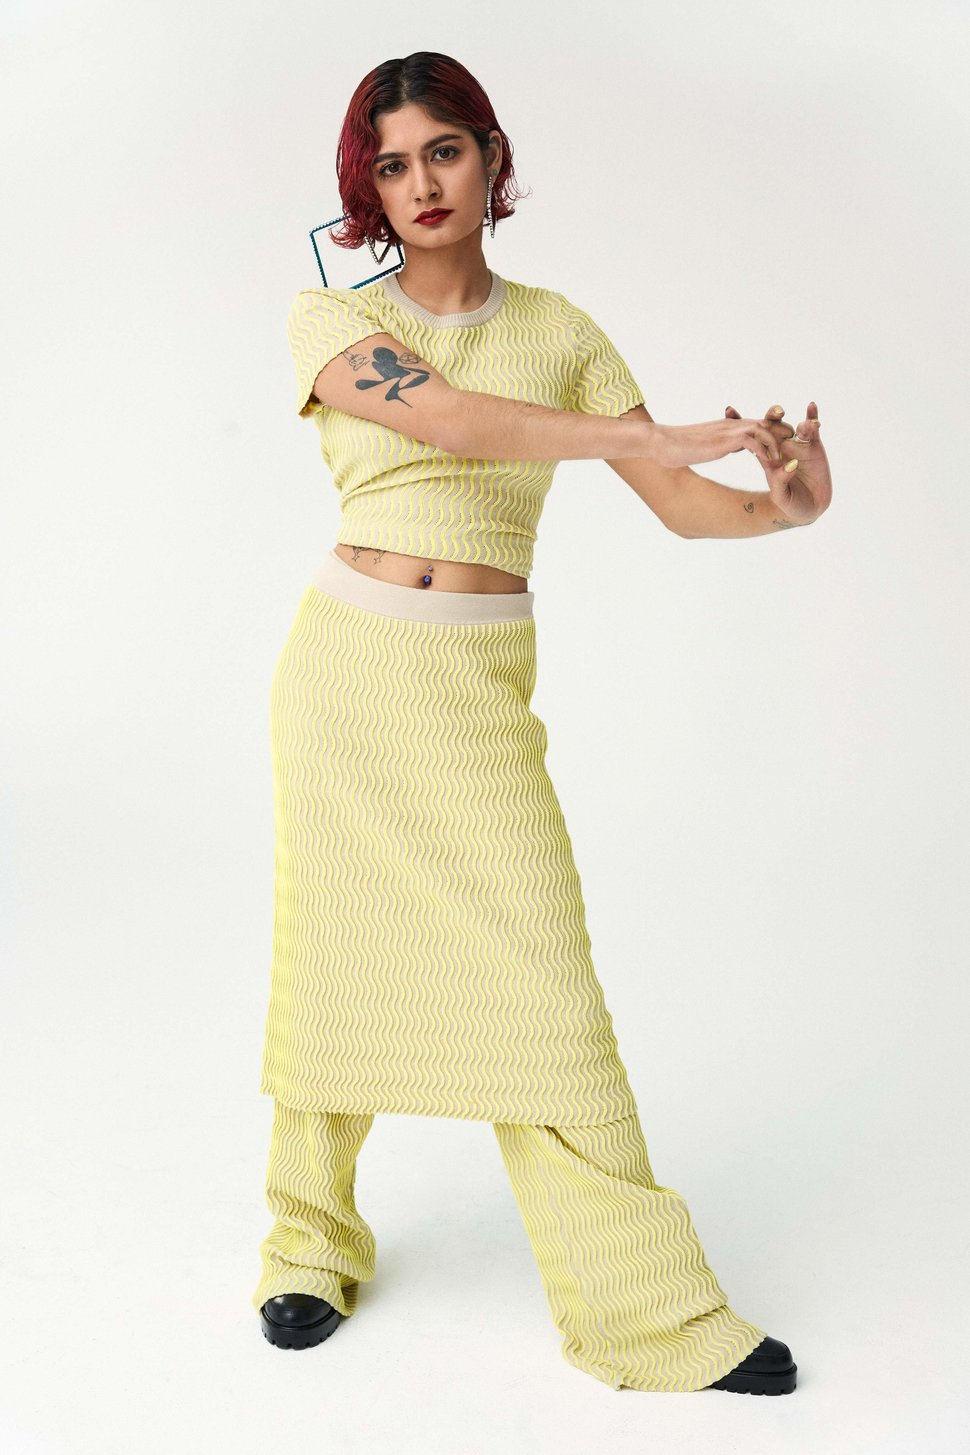 Shireen Ahmed (writer, public speaker, activist).